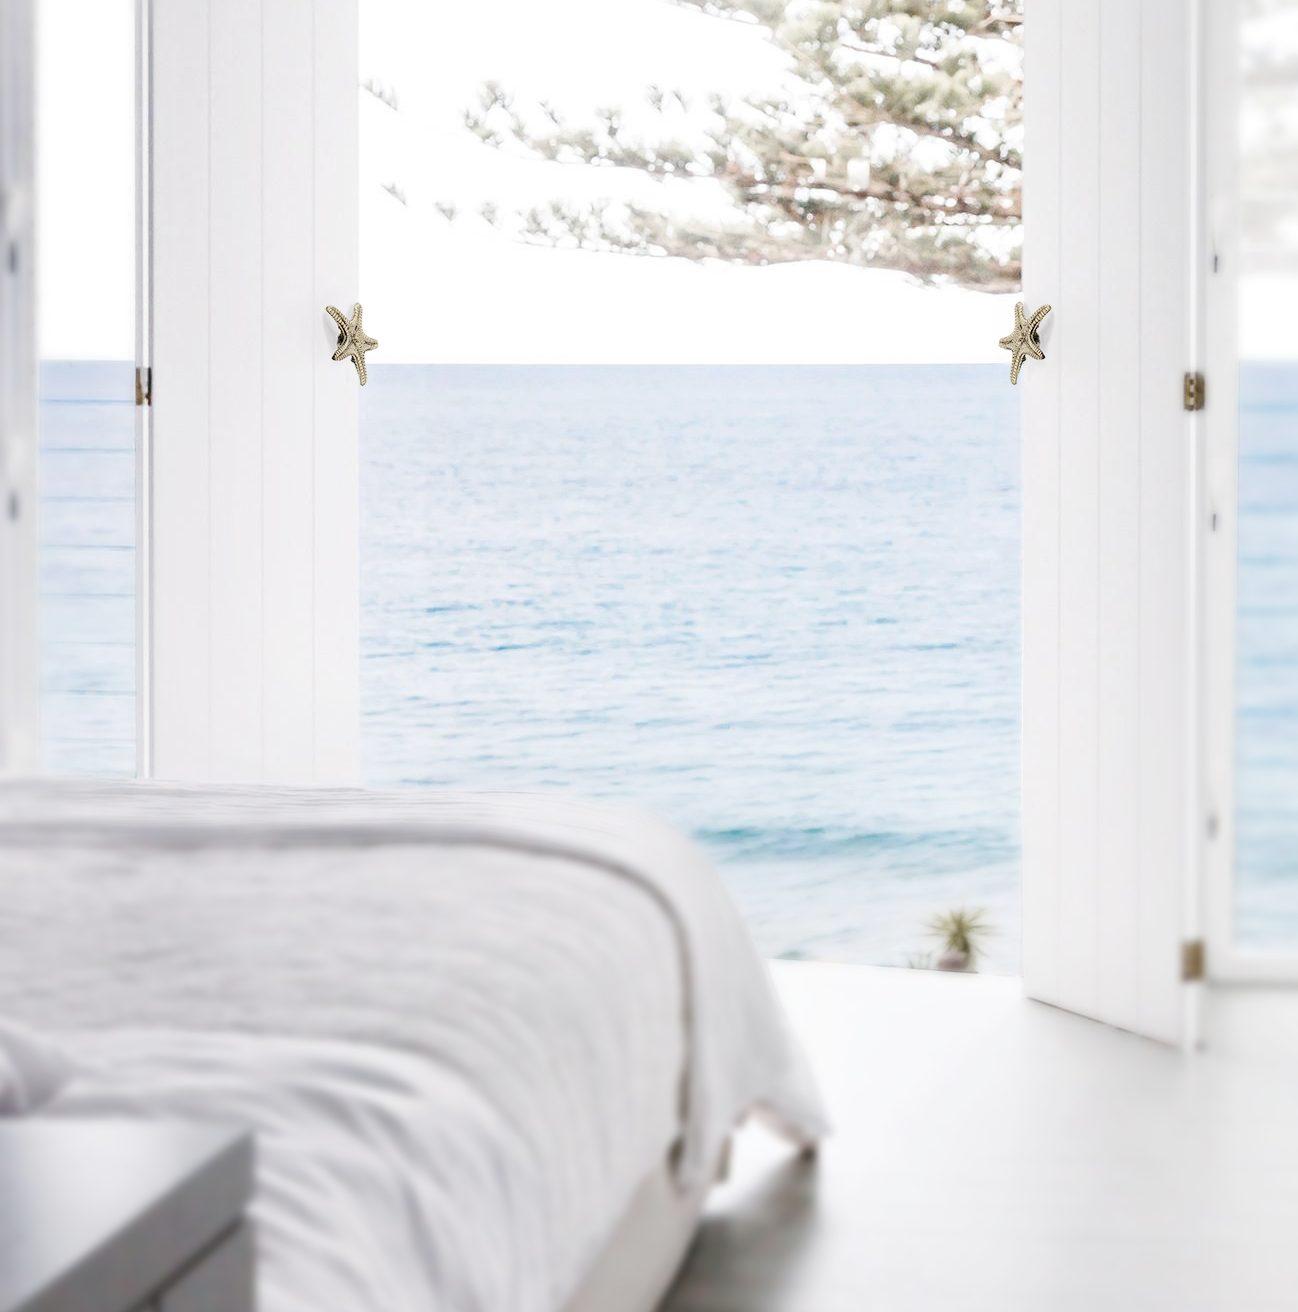 Summer Decor Ideas For a Stylish Staycation With The Best Hardware summer Summer Decor Ideas For a Stylish Staycation With The Best Hardware linckia12 e1618507323332